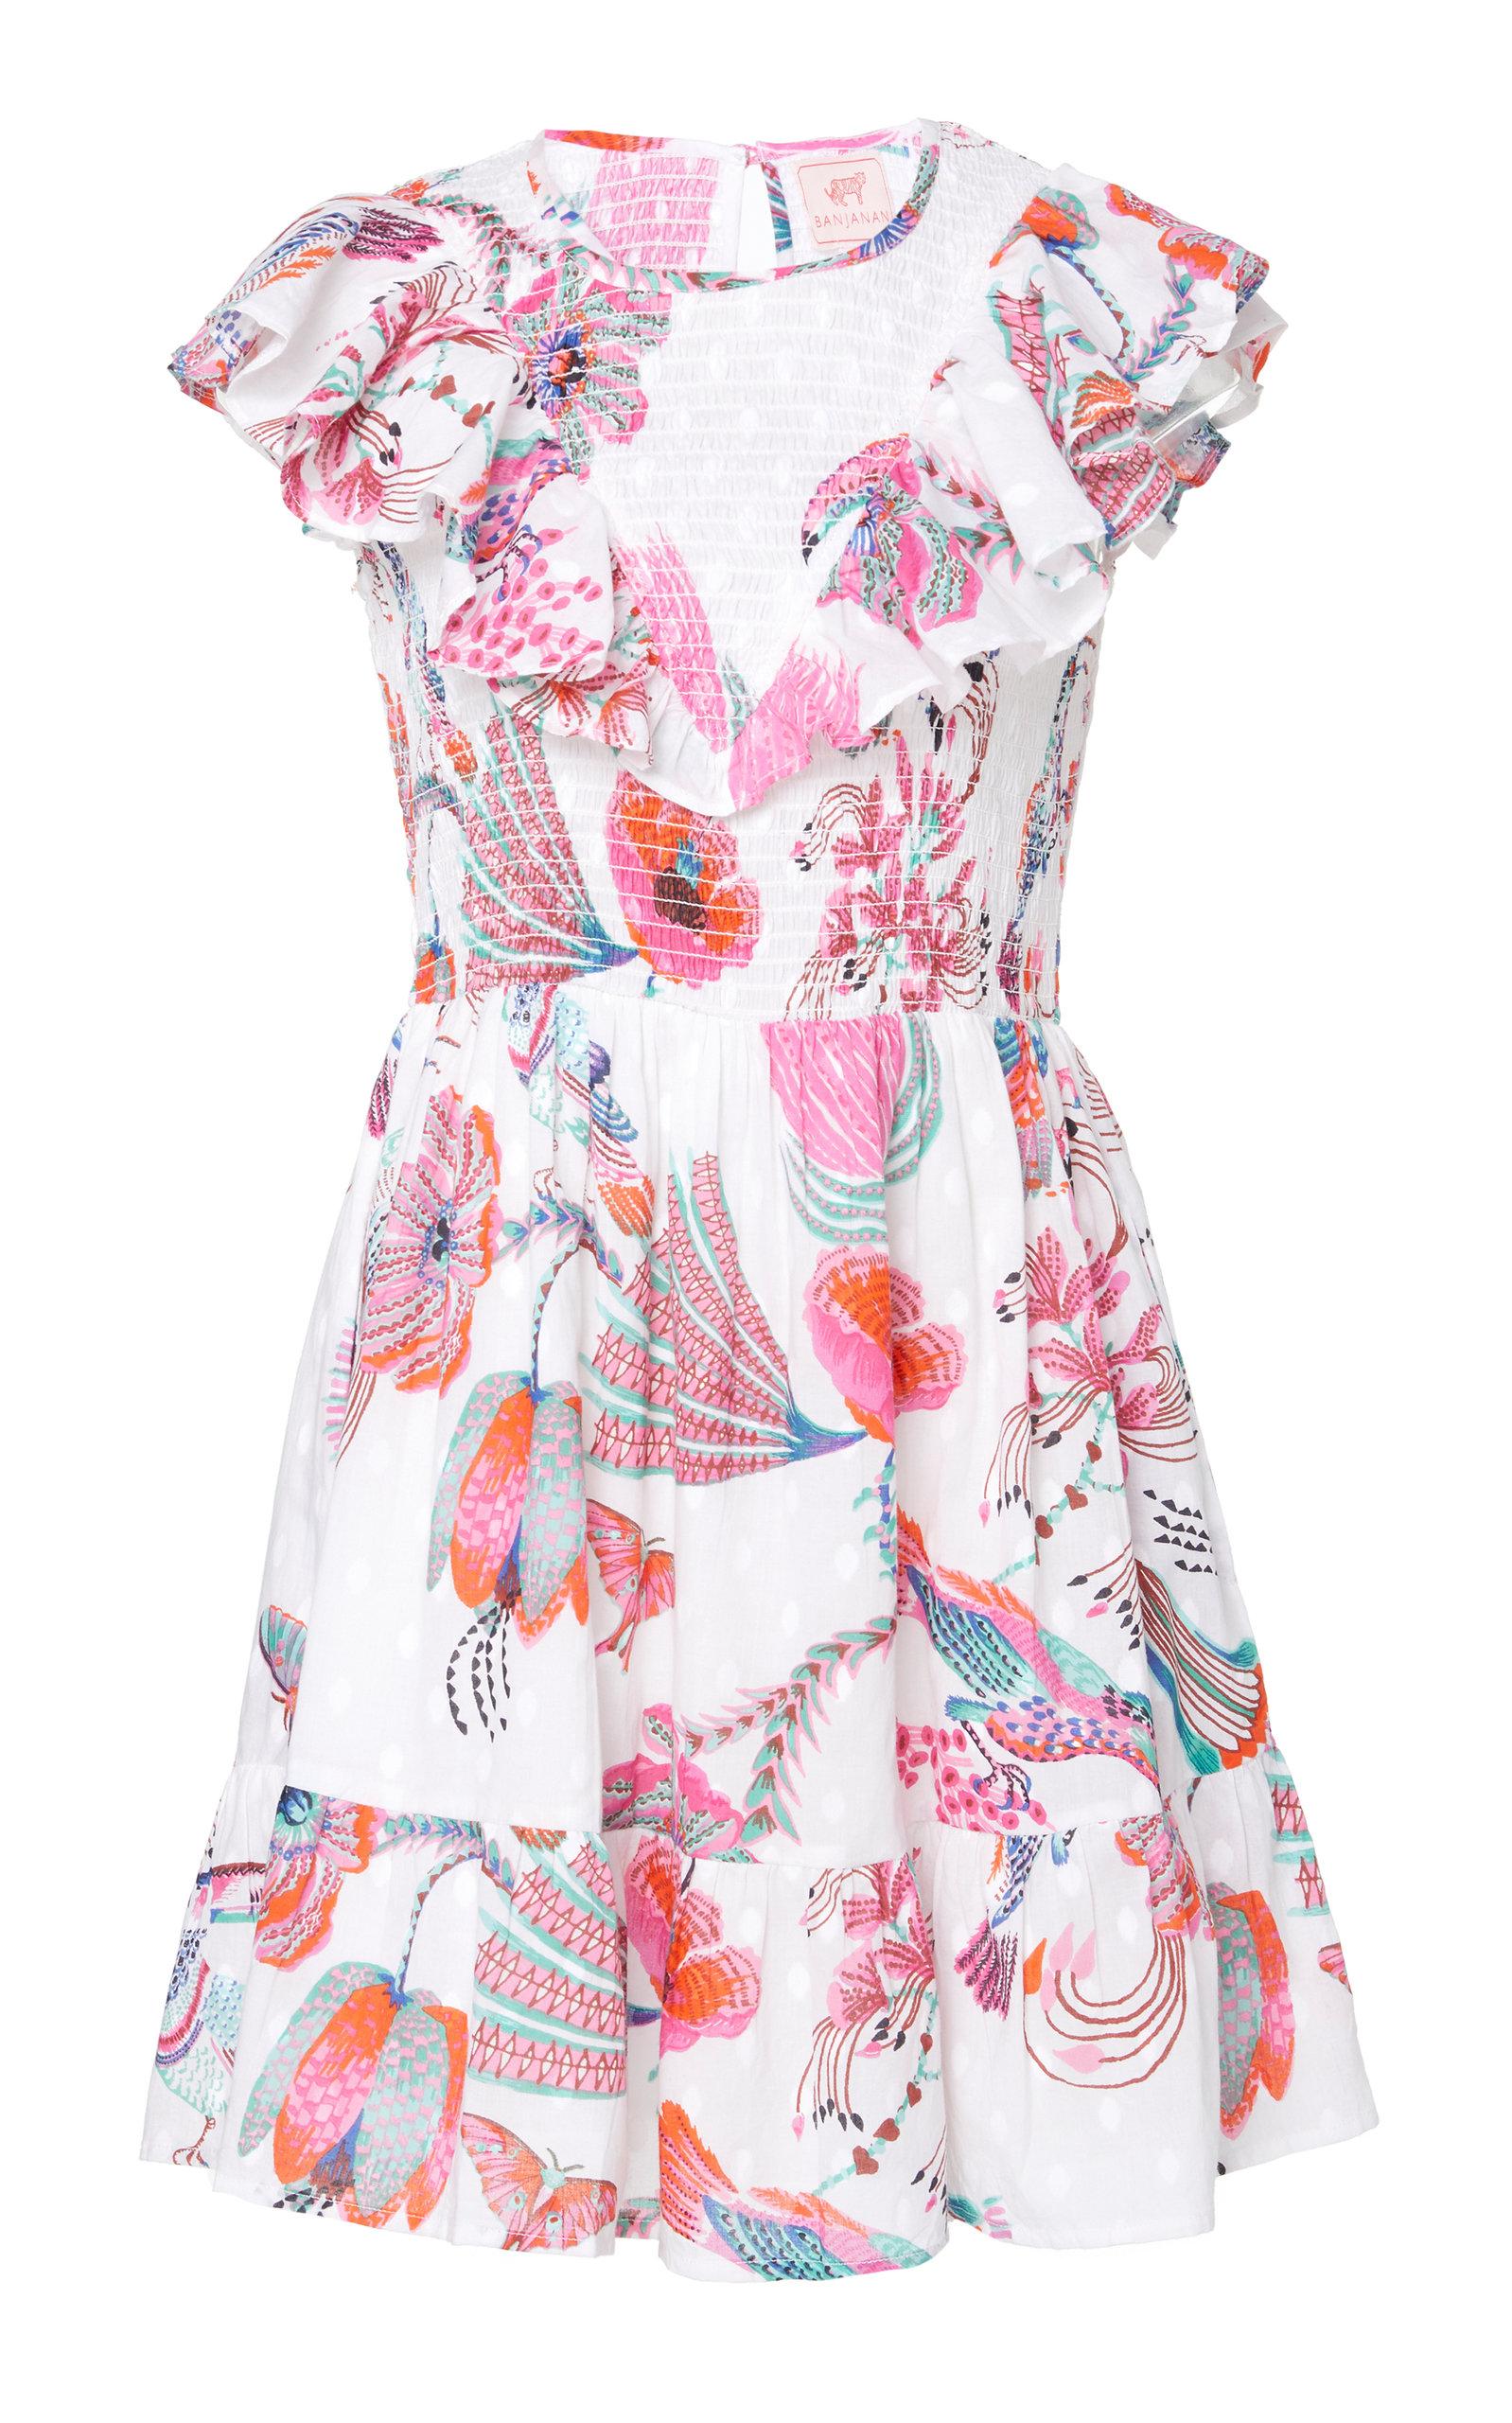 Buy Banjanan Ilona Floral-Printed Cotton Mini Dress online, shop Banjanan at the best price